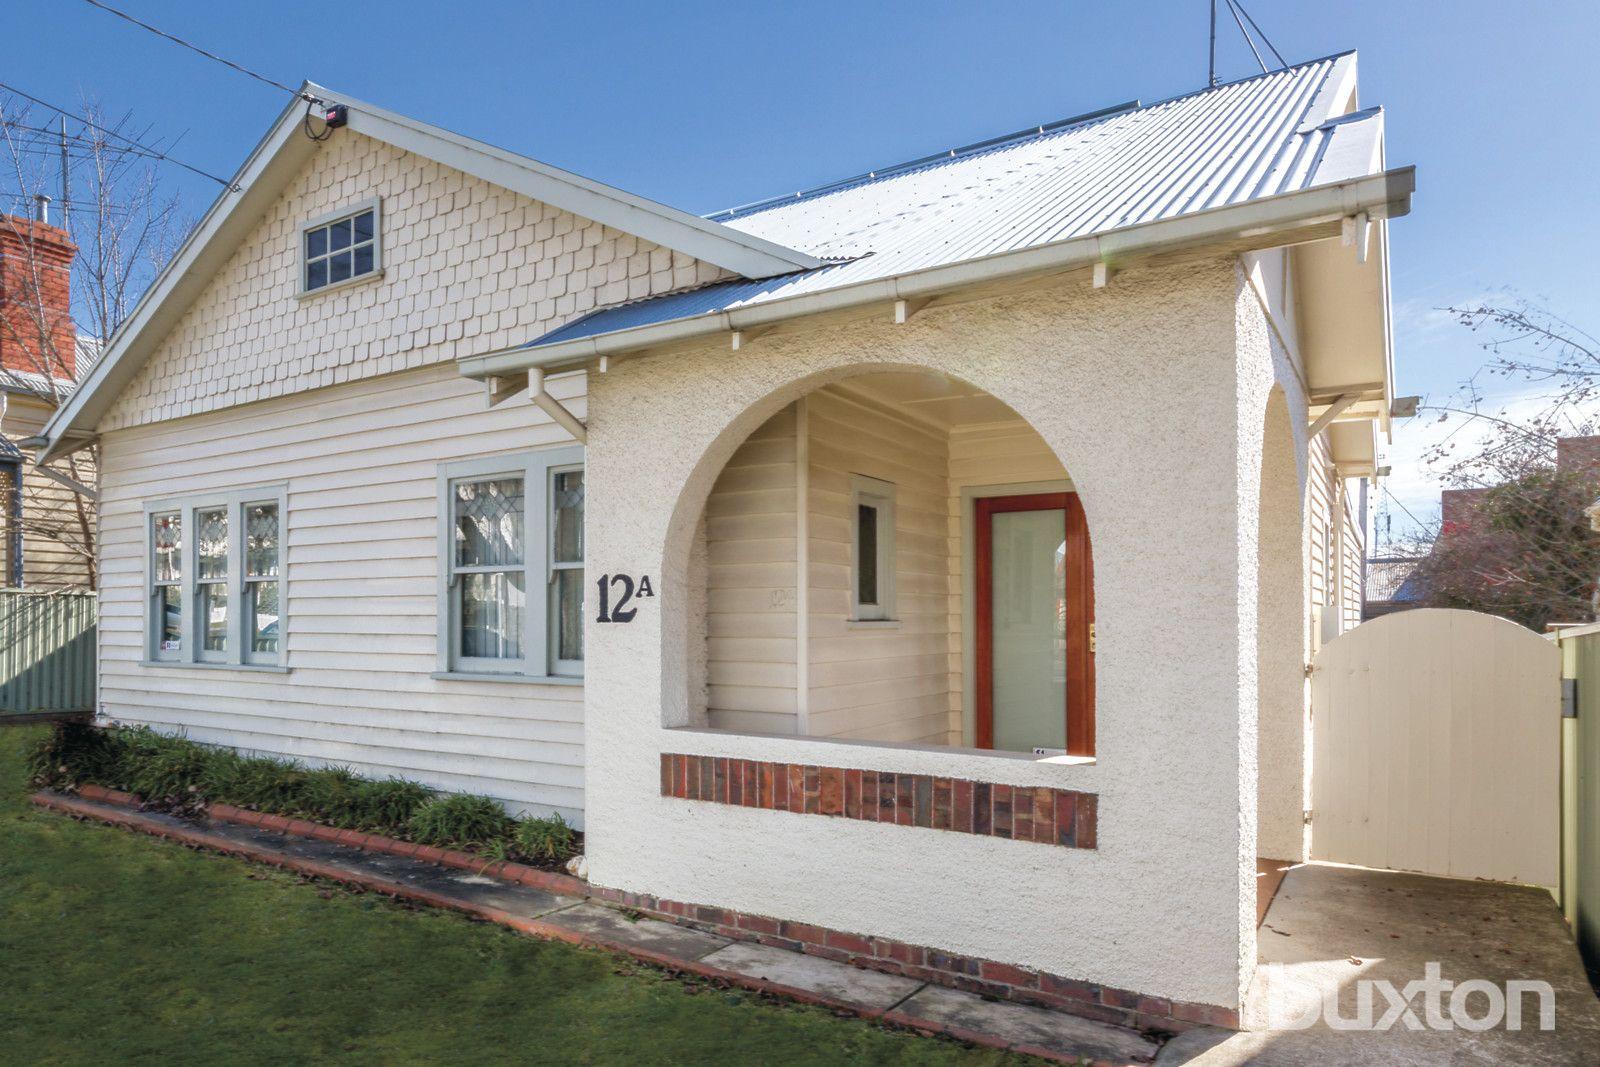 12a Webster Street, Ballarat Central VIC 3350, Image 0